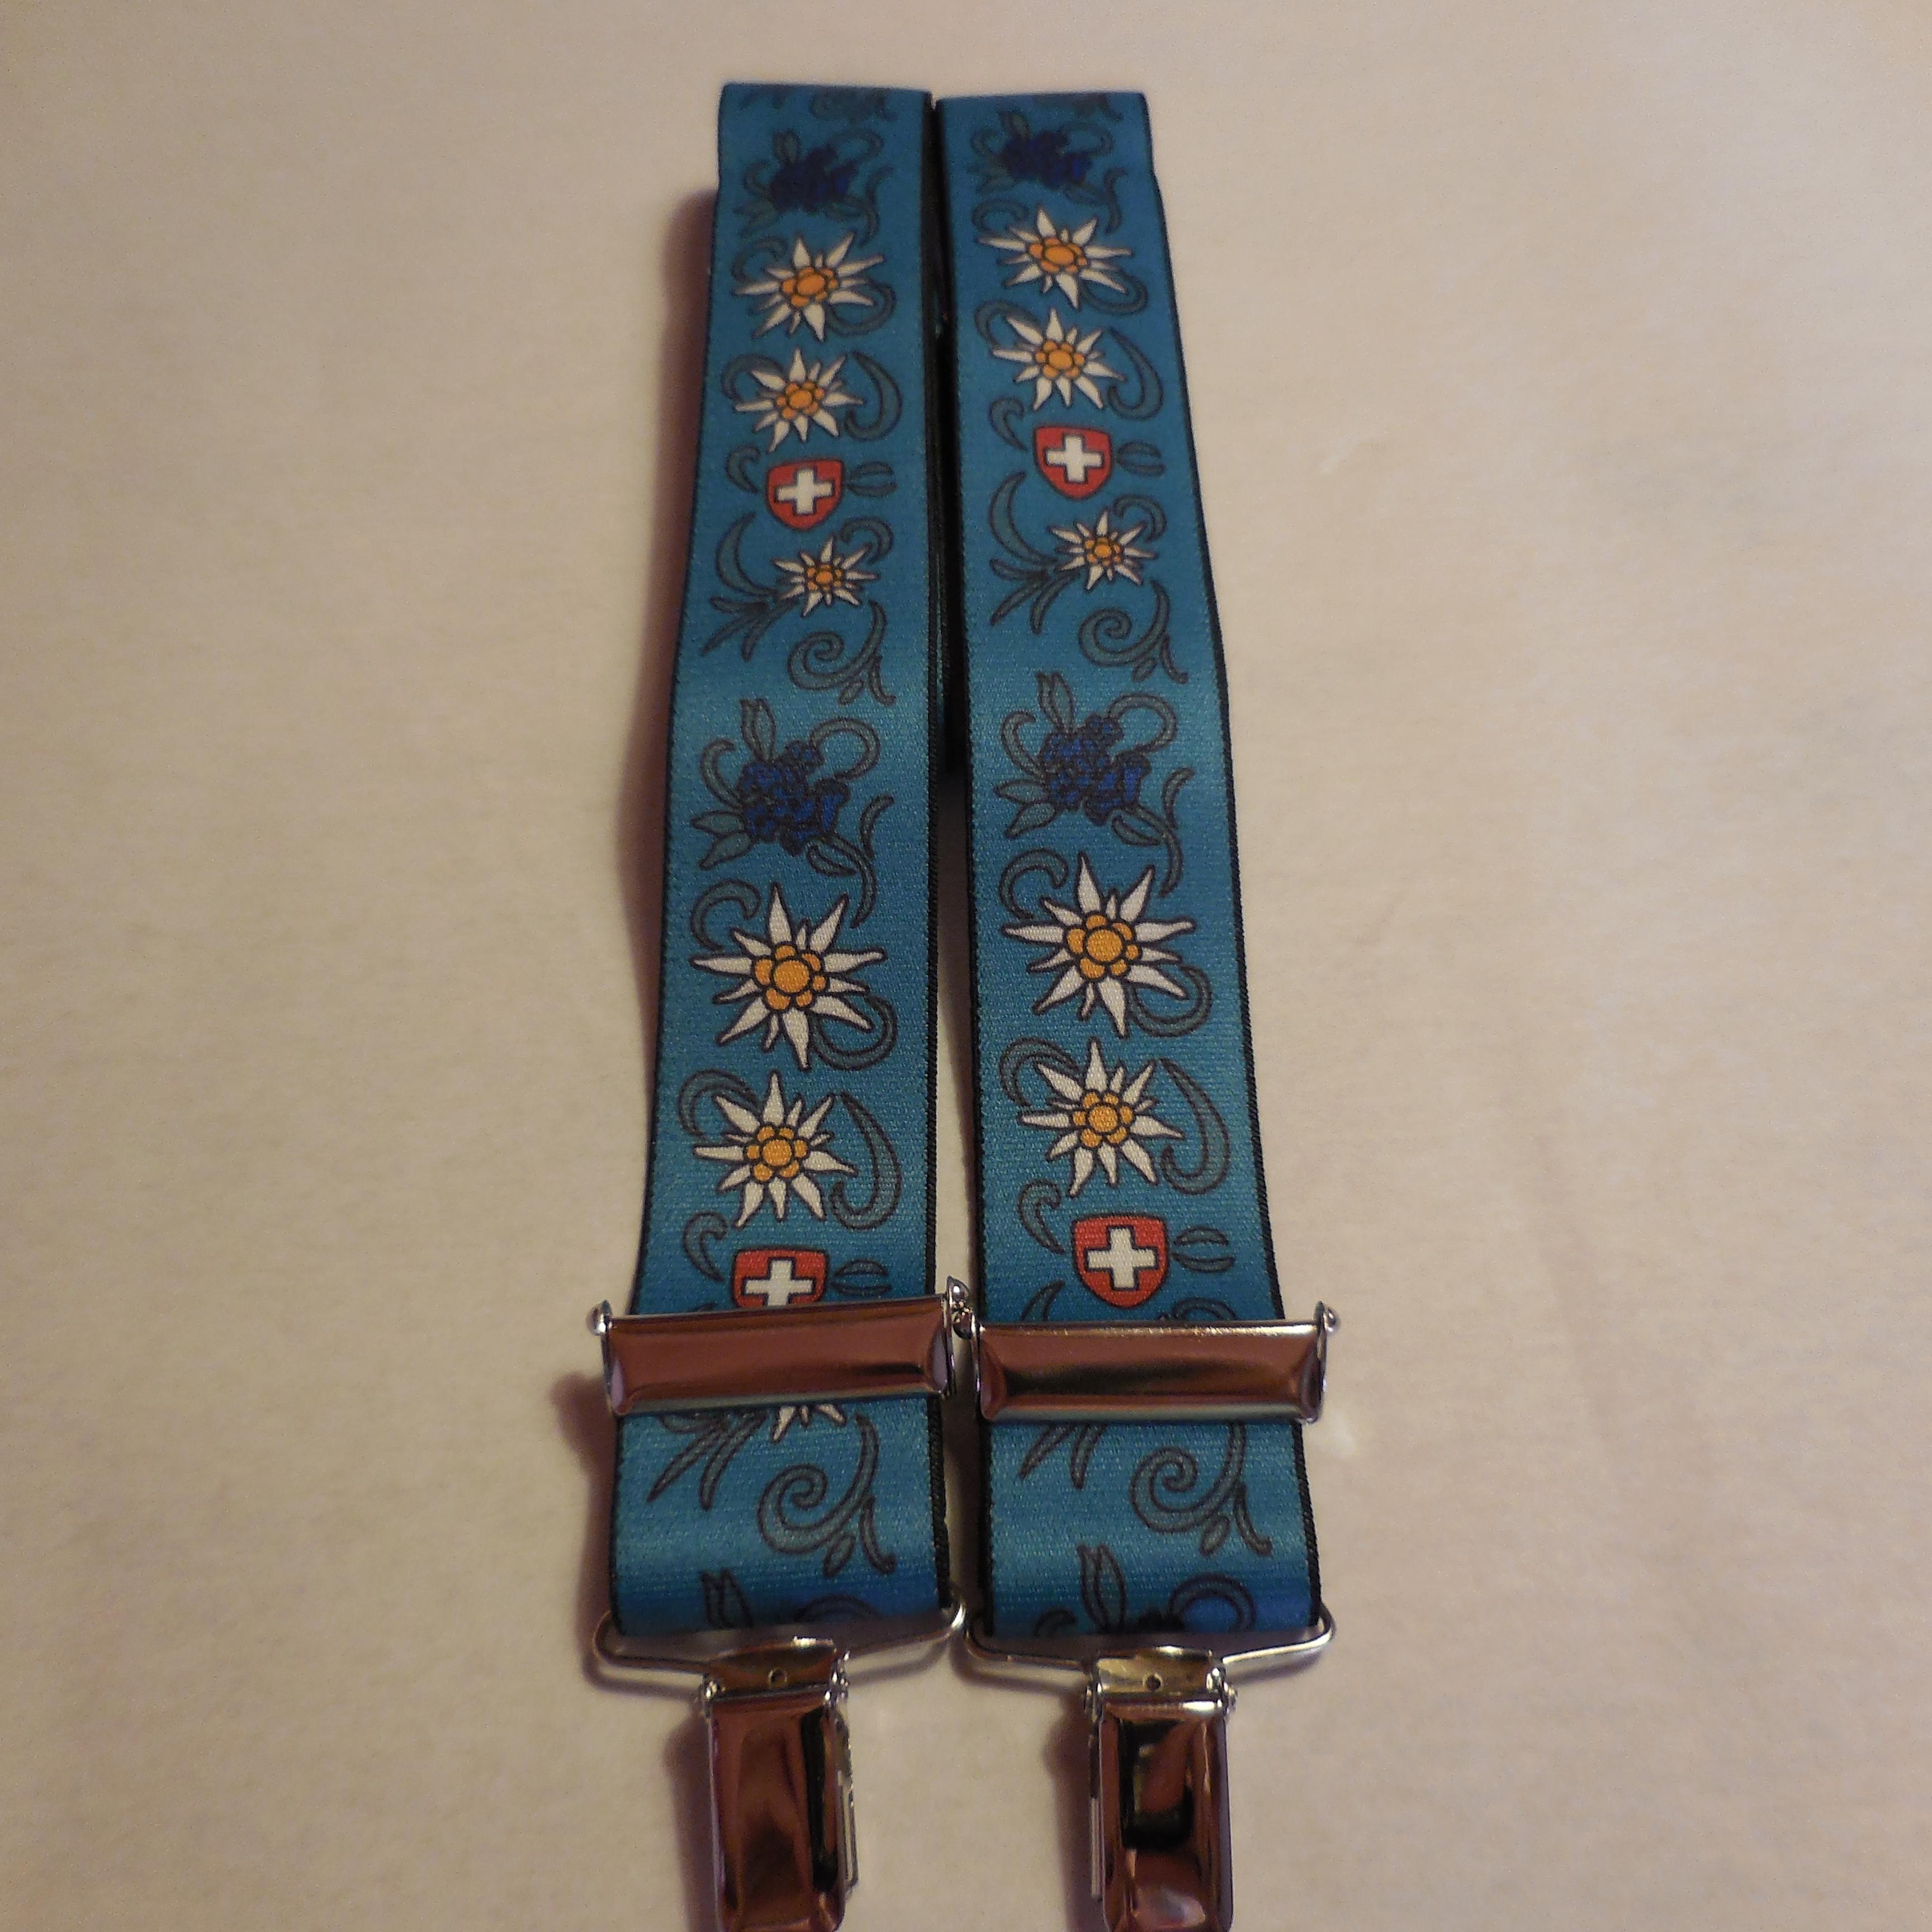 Hosenträger blau mit Edelweiss & Enzian